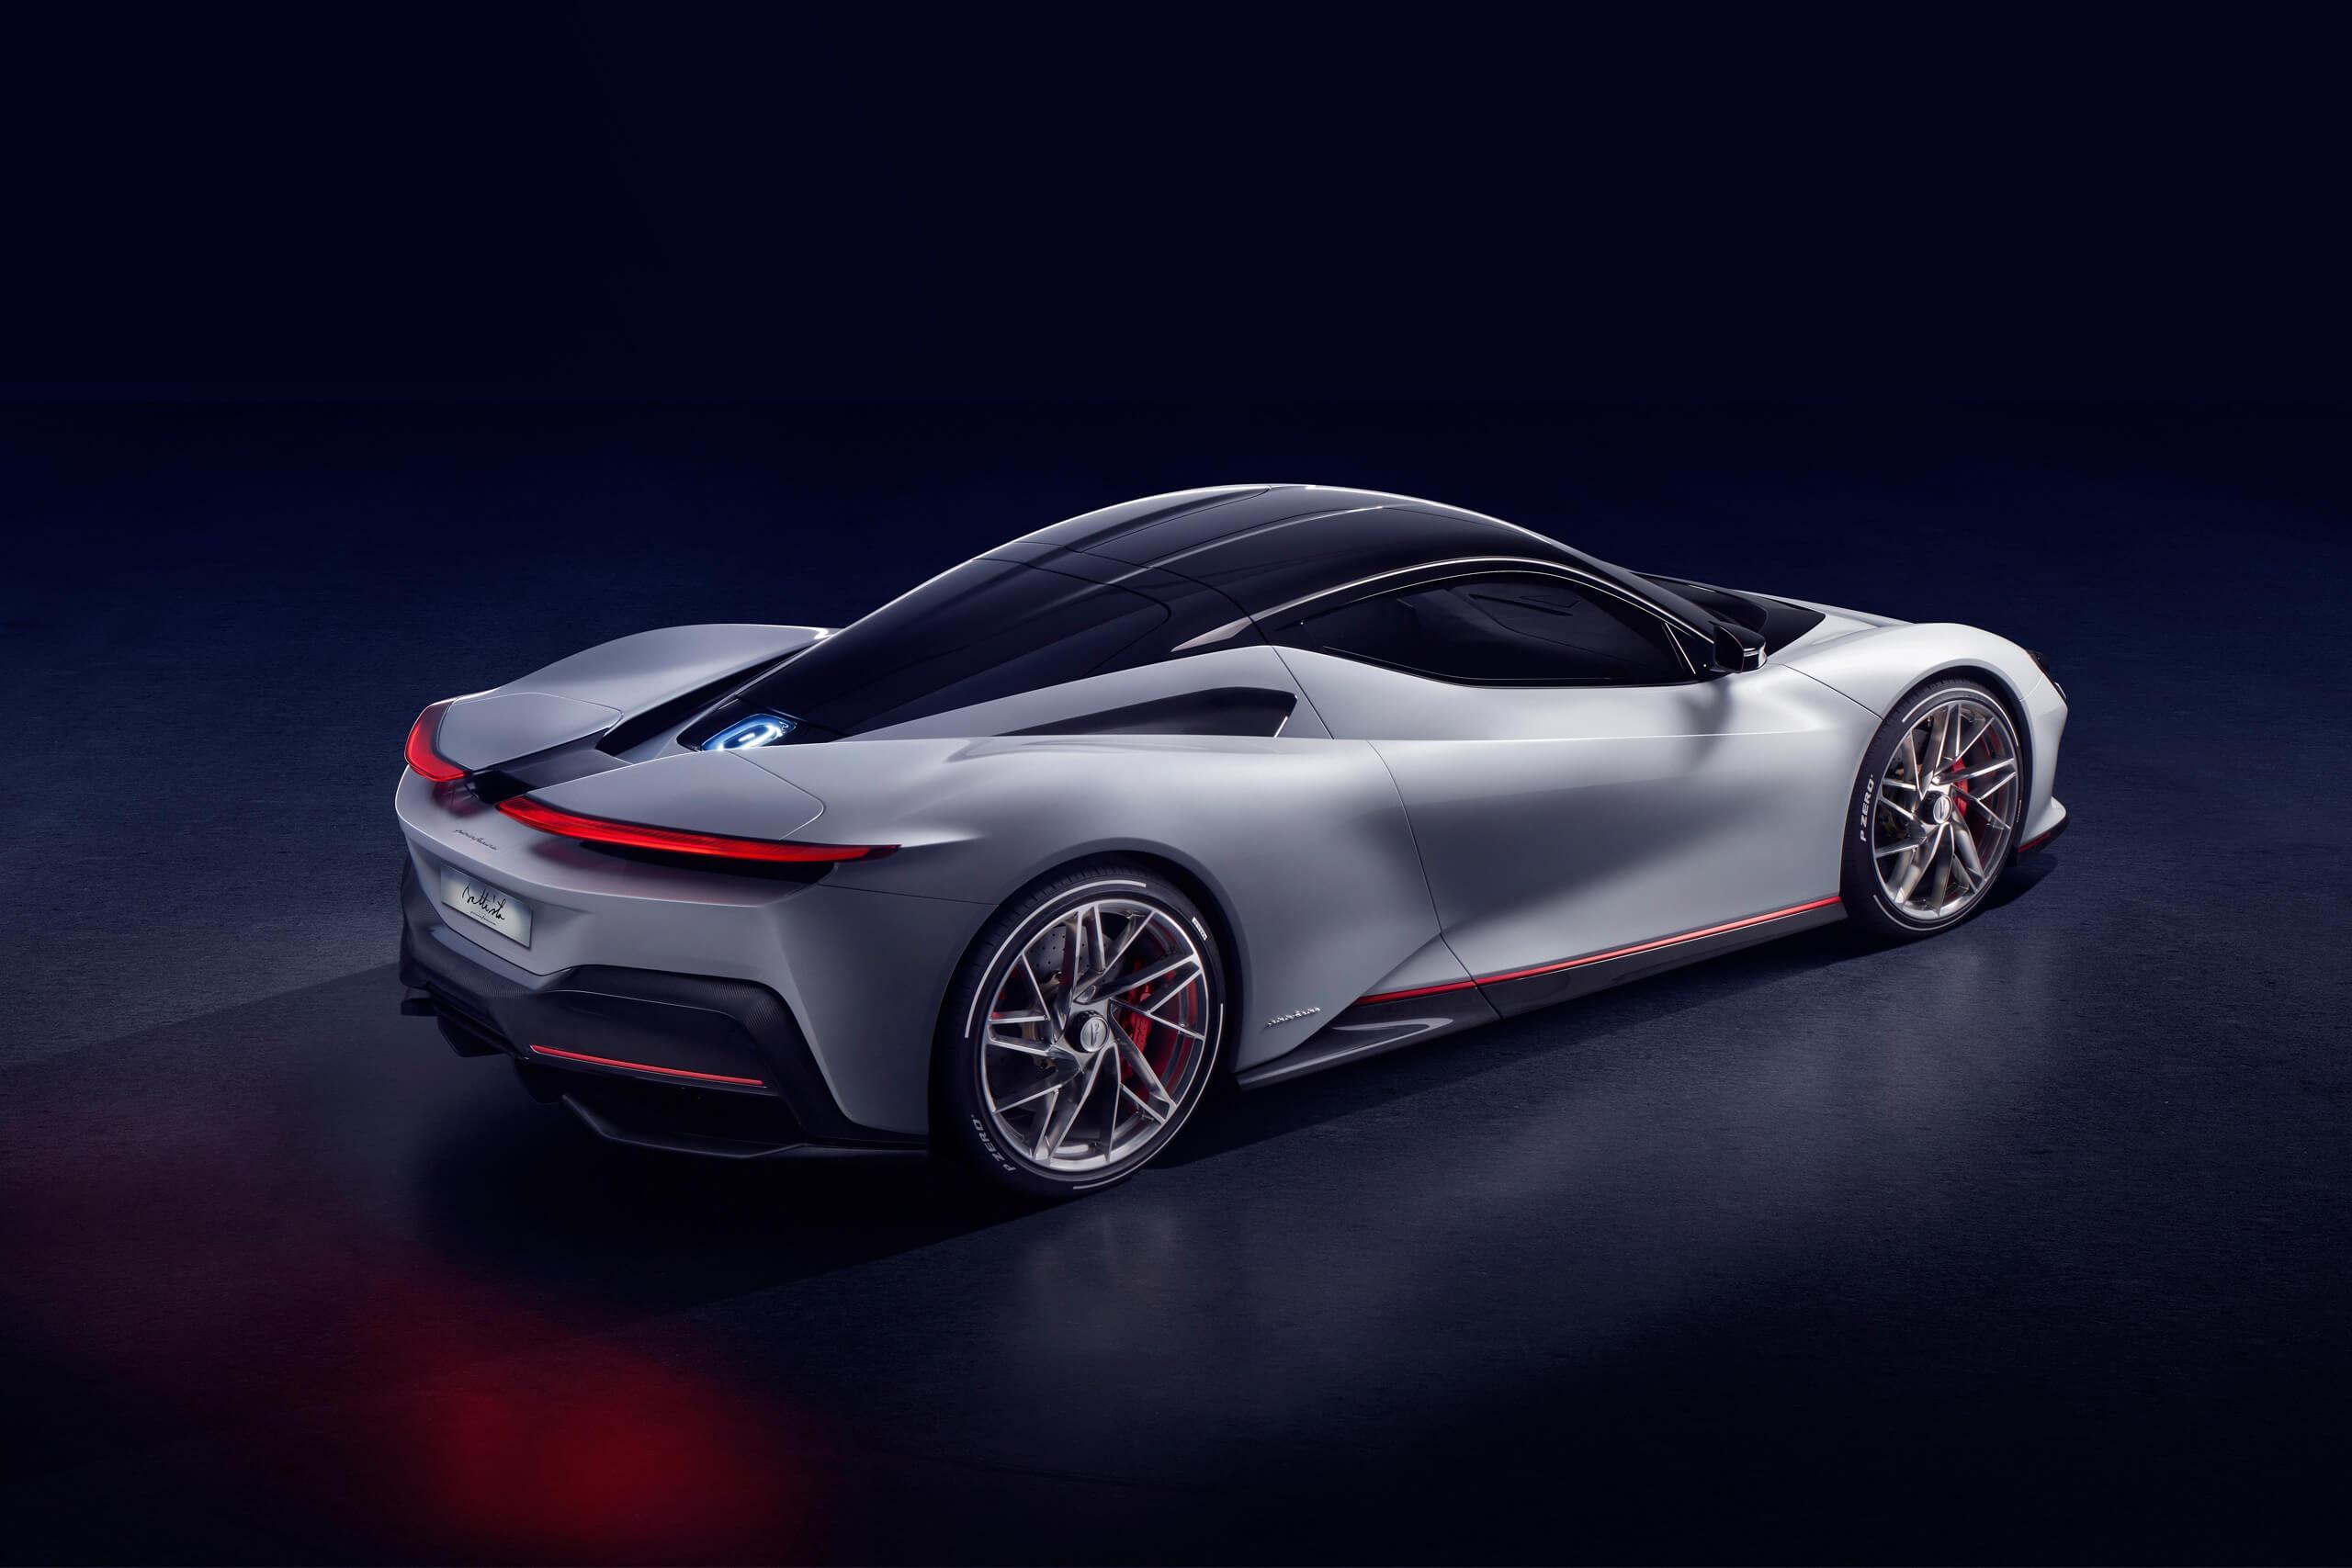 Is The Pininfarina Battista Better Than The Tesla Roadster?